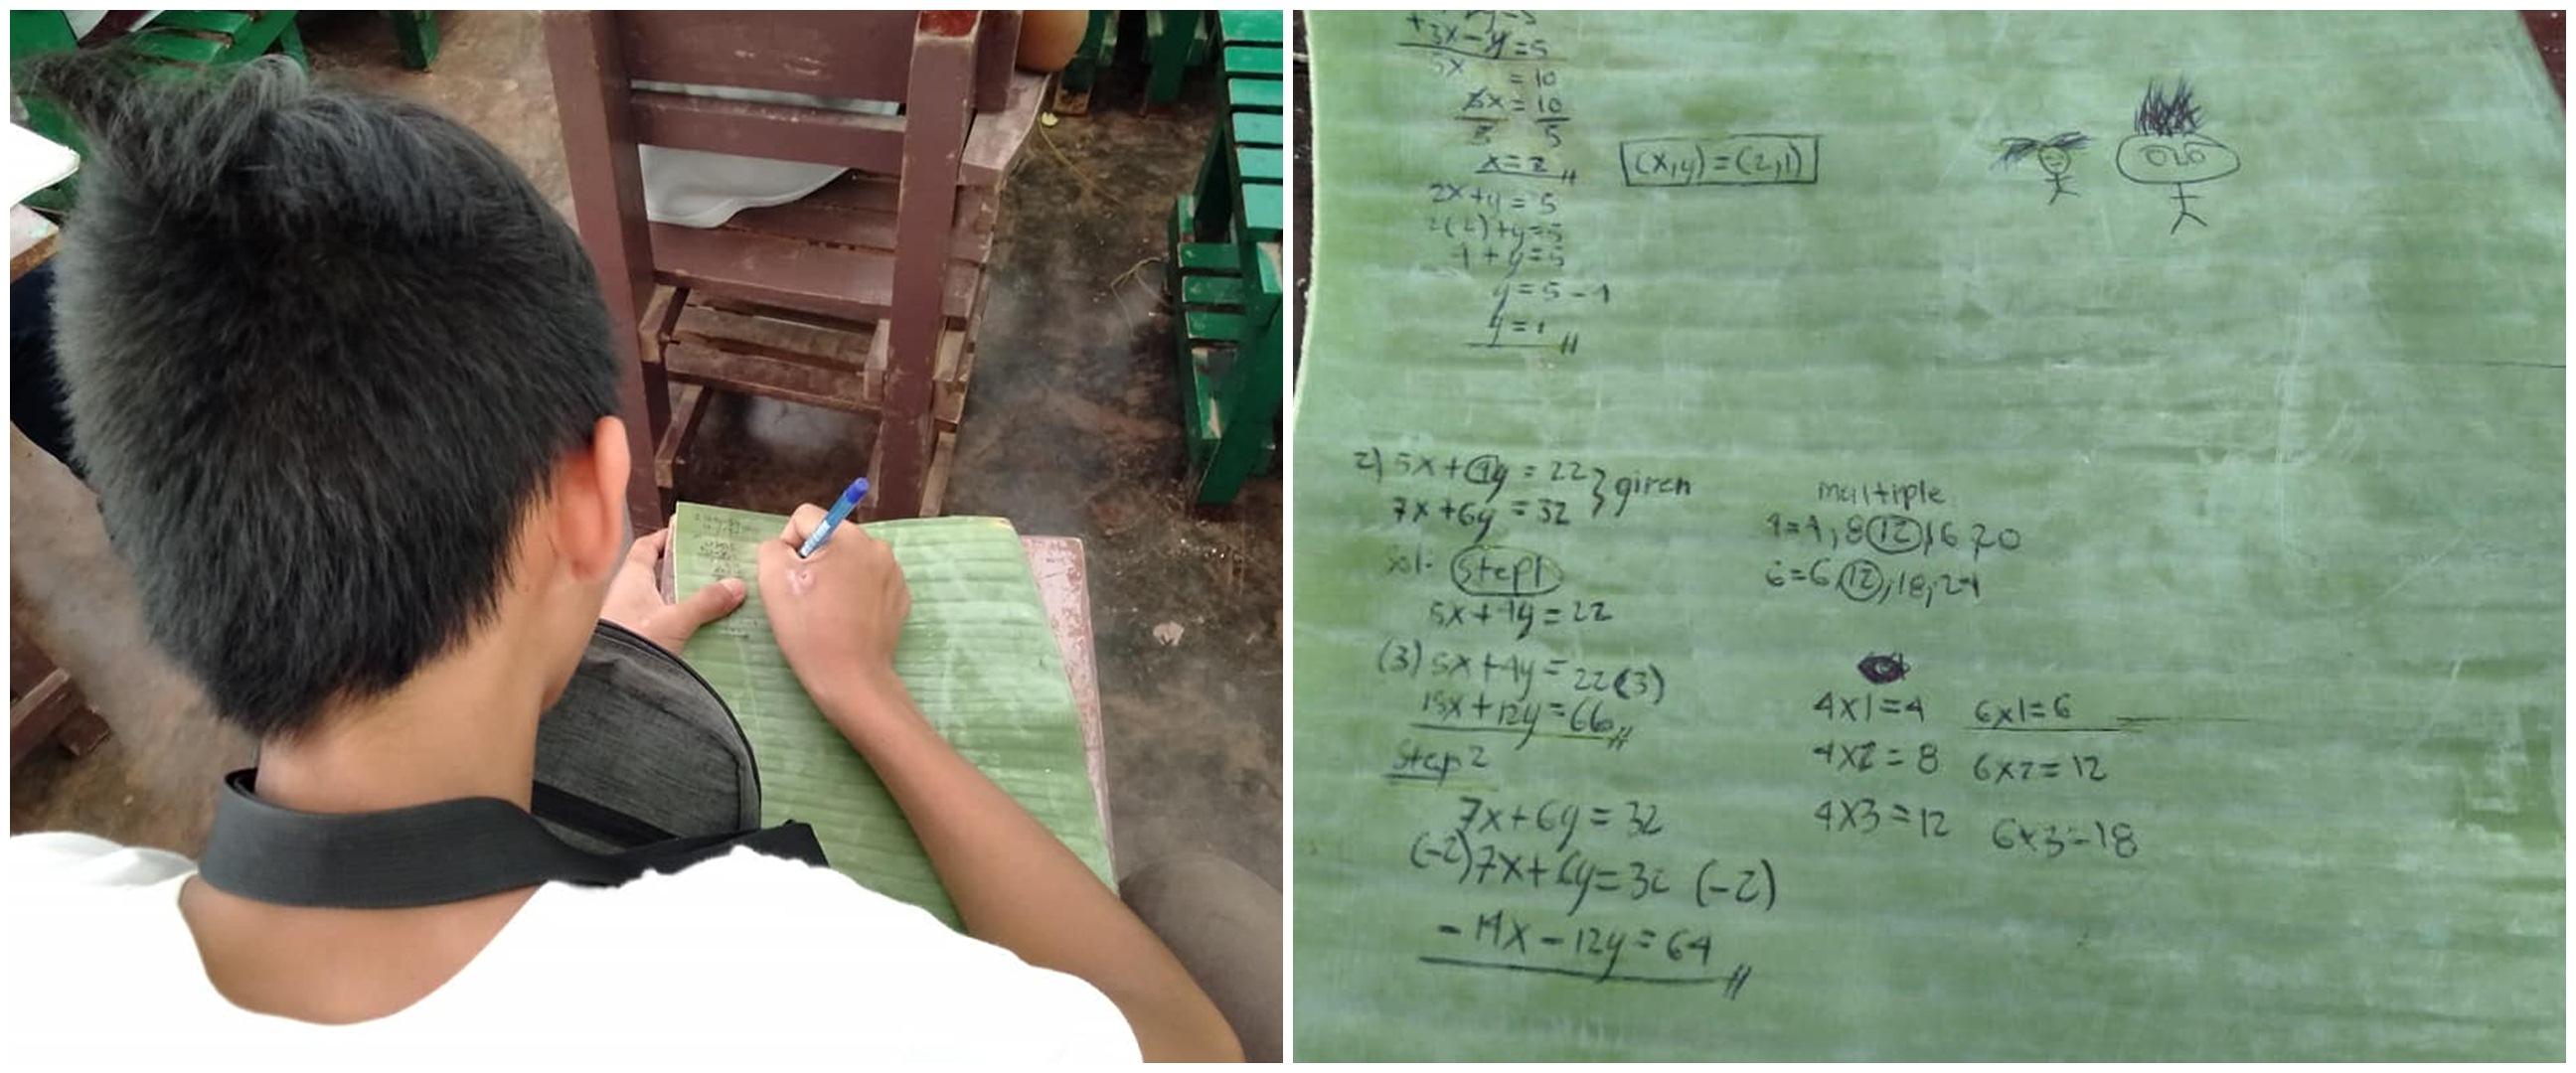 Kisah haru murid menulis di daun pisang sebagai pengganti buku tulis